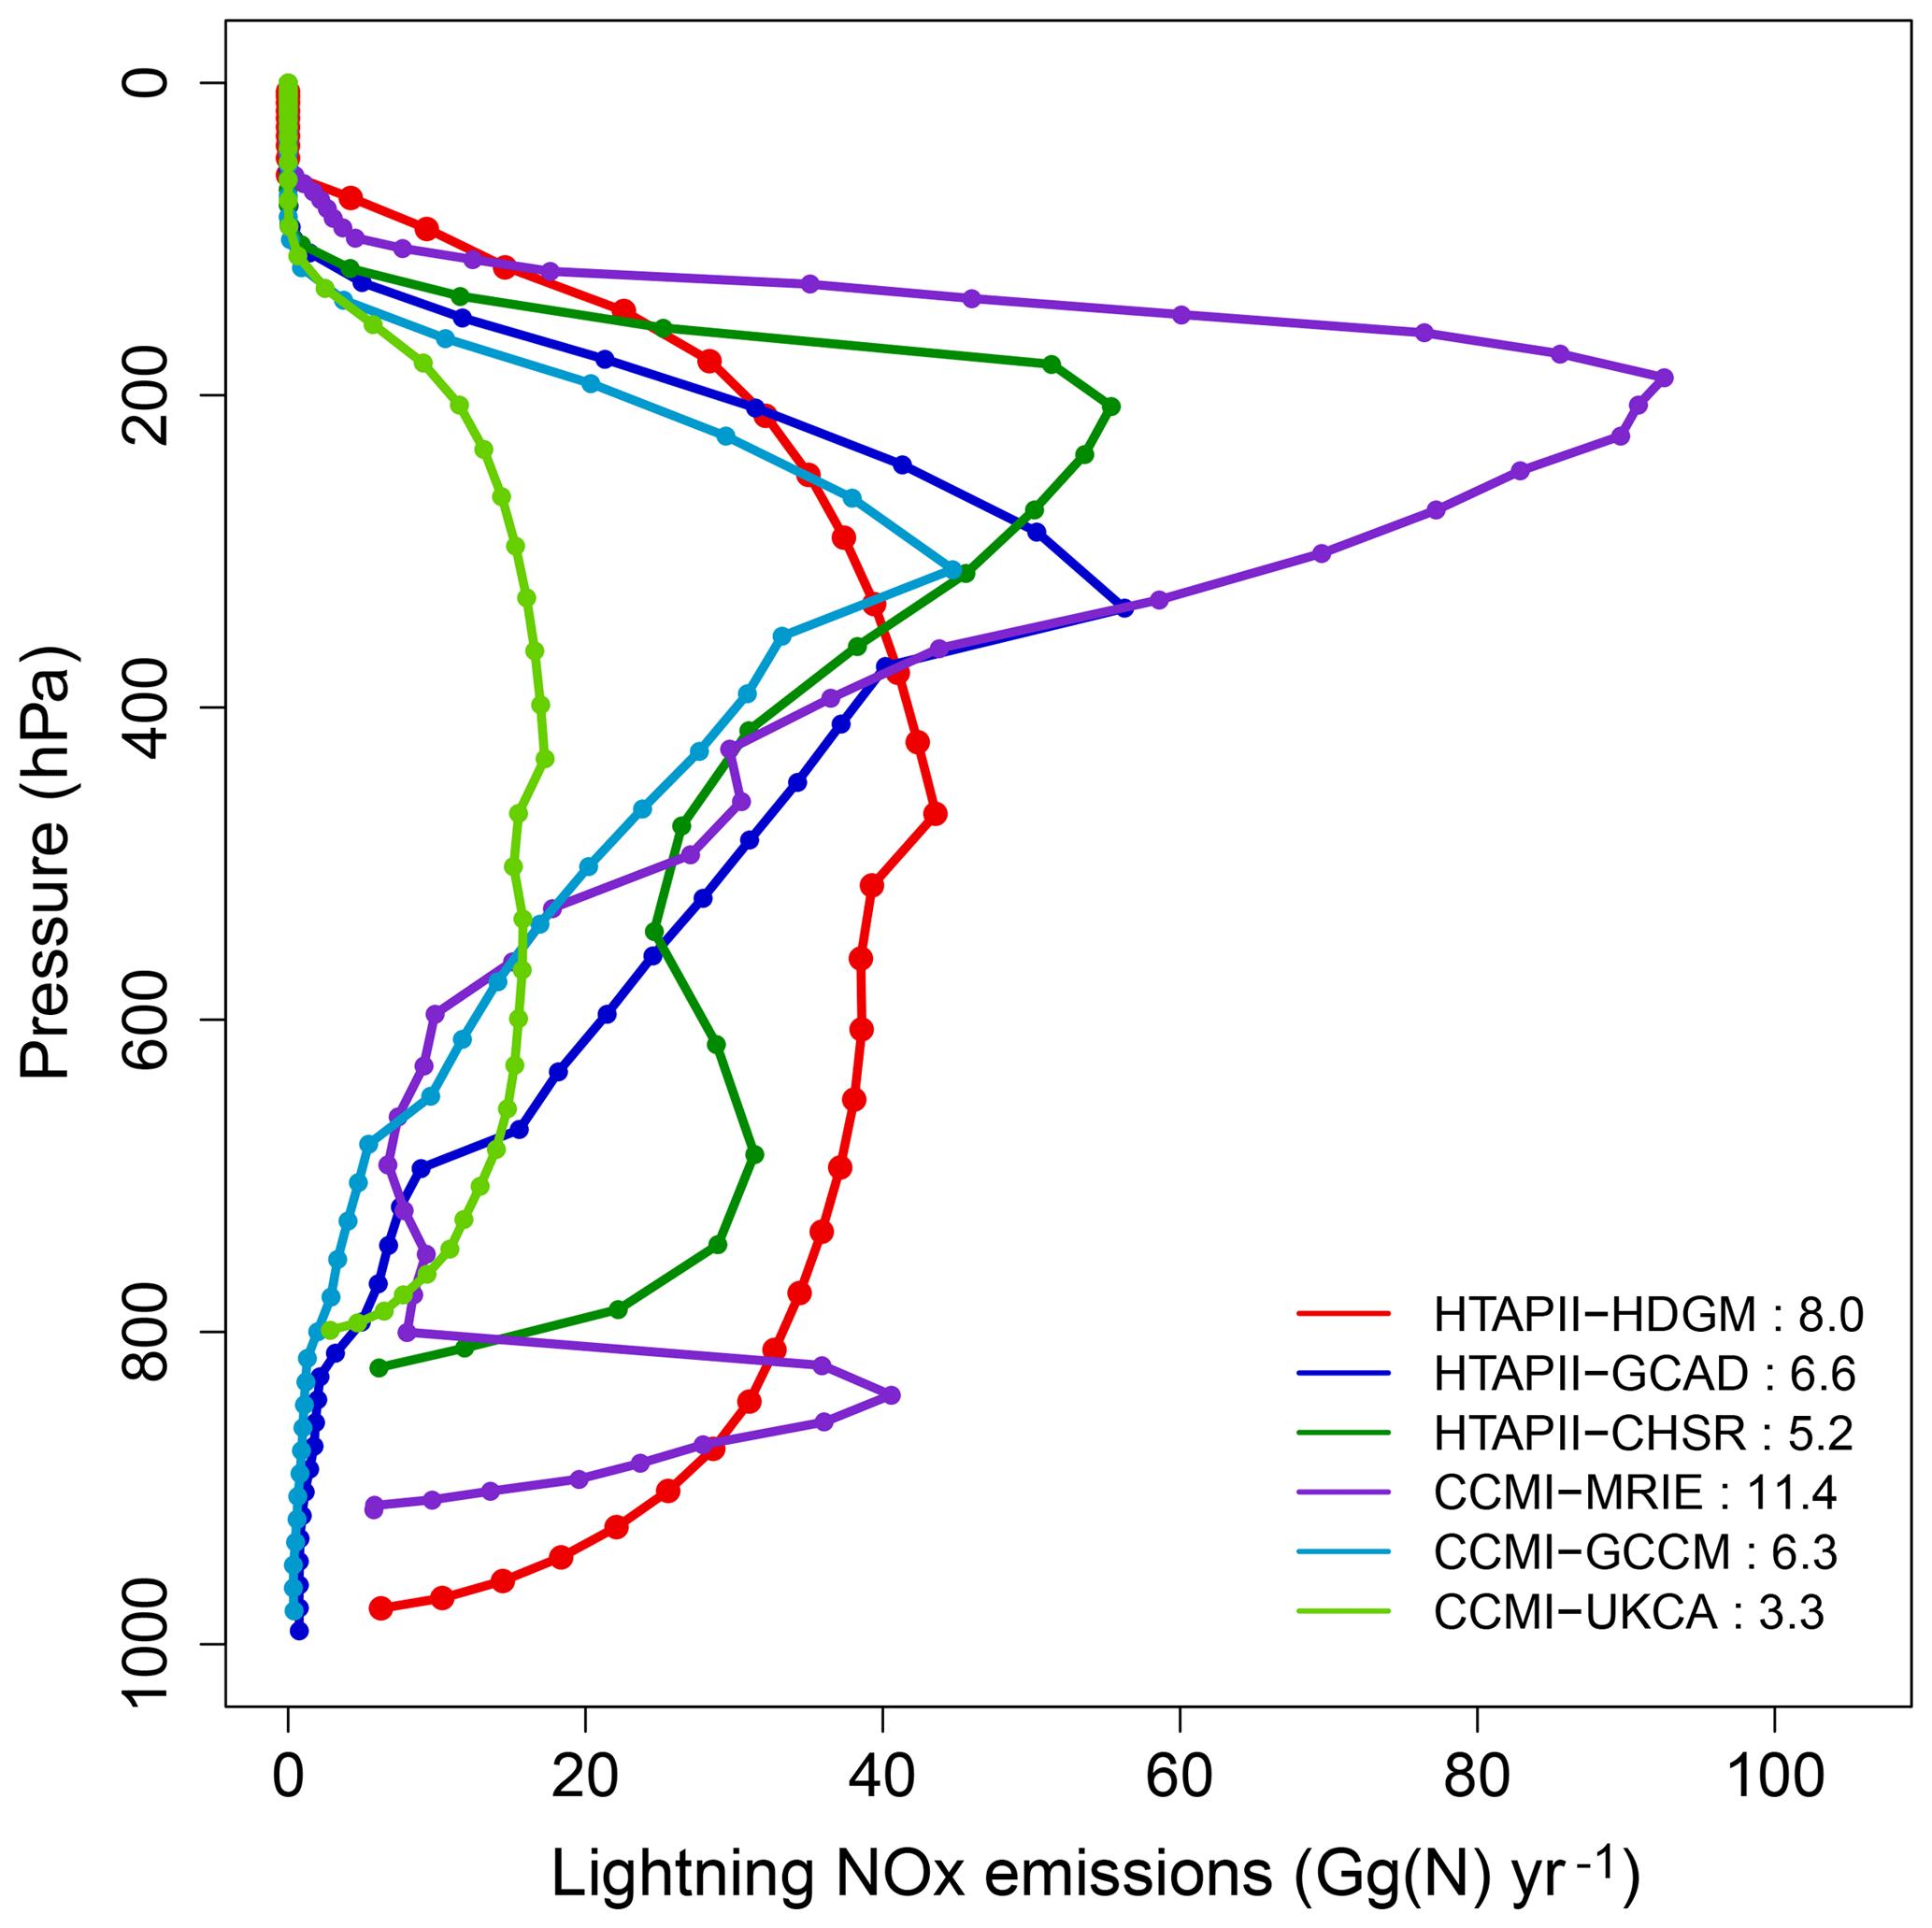 ACP - Evaluation of tropospheric ozone and ozone precursors in